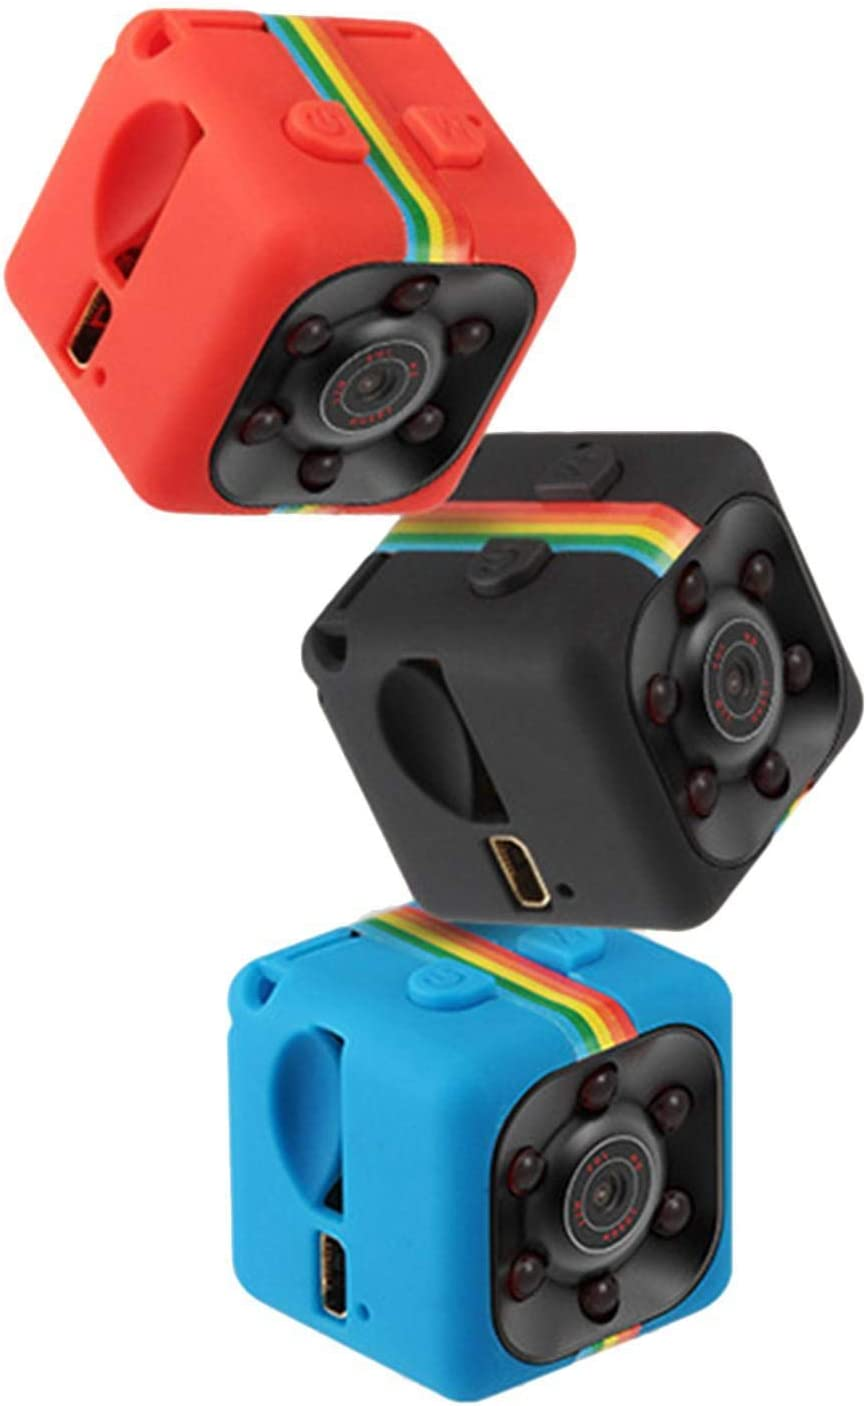 GEESENSS Voiture HD Mini Cam/éra 360 Degr/és Enregistrement Vid/éo Support TF Cam/éras embarqu/ées